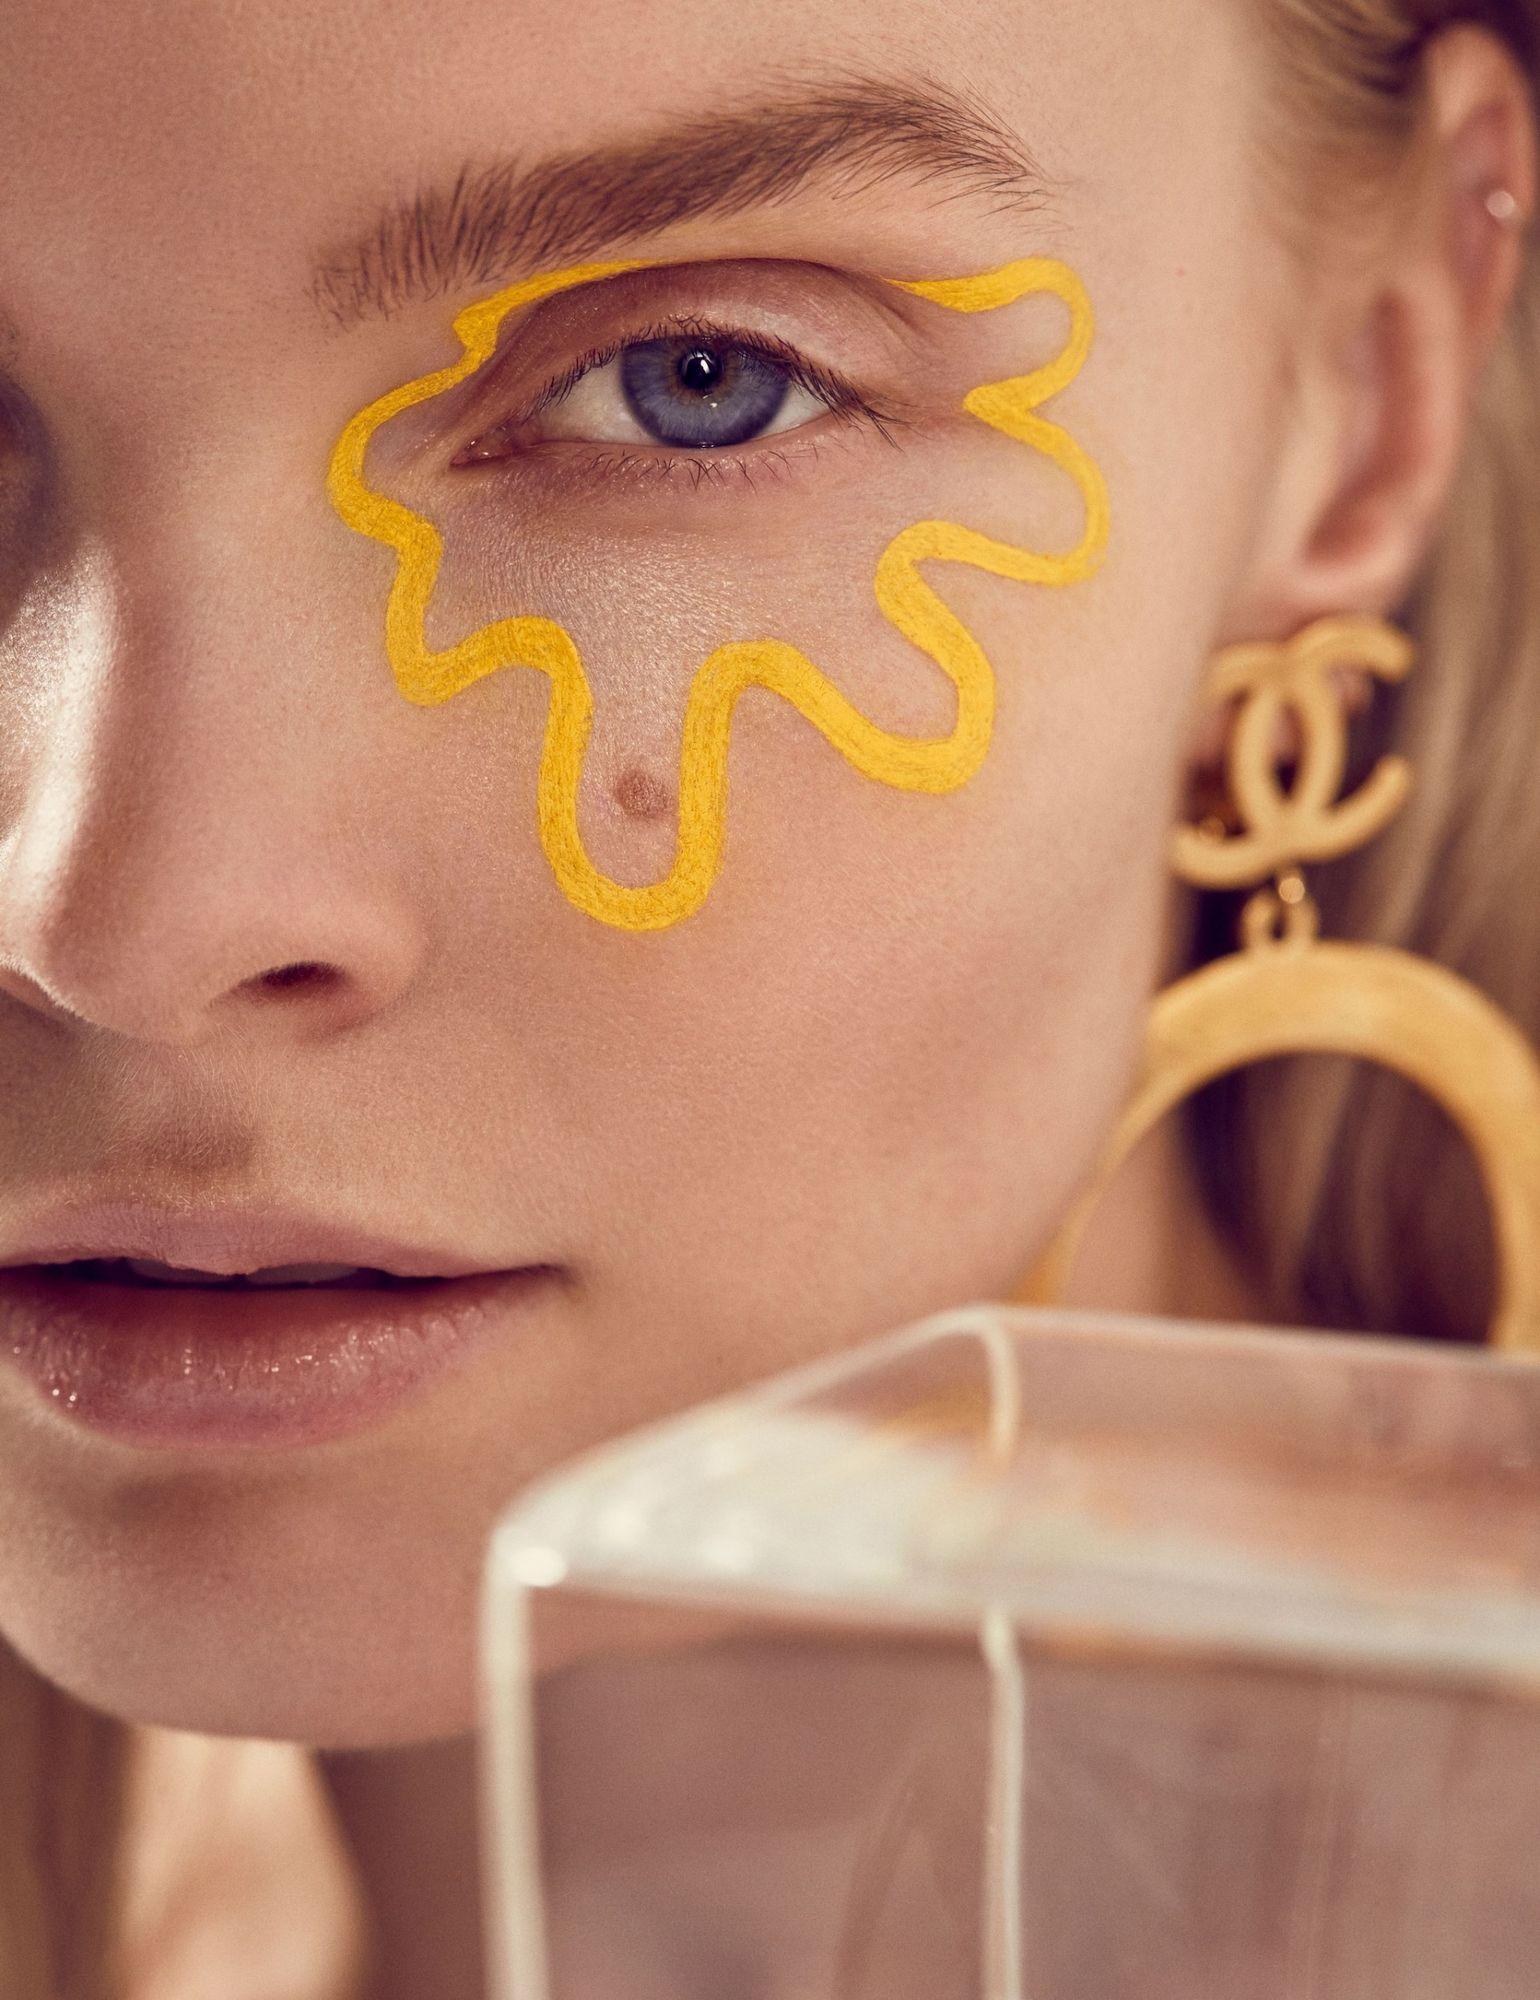 COSMOPOLA | Frauke Fischer for Marie Claire